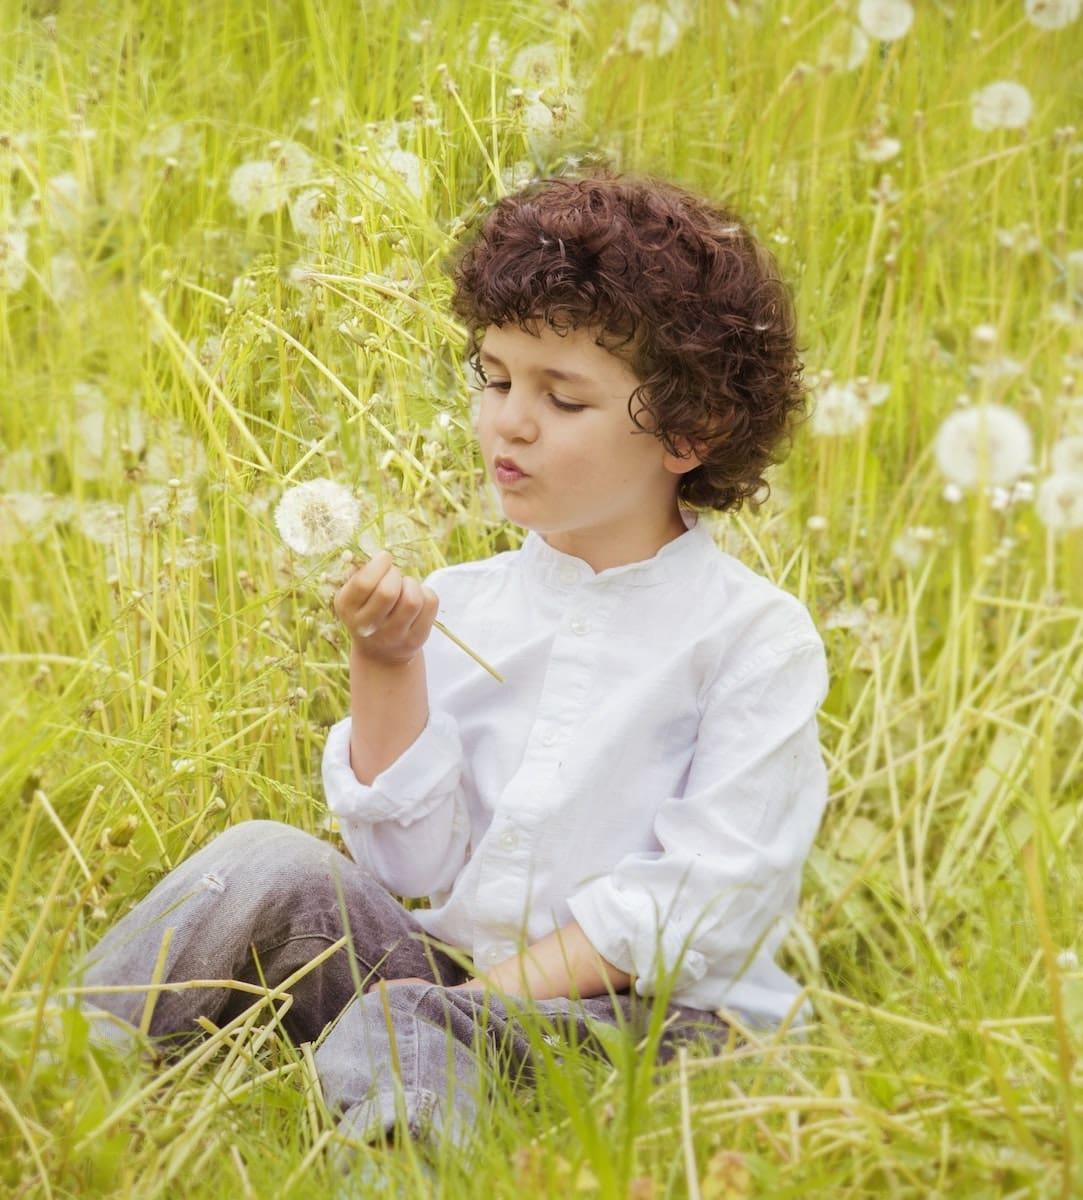 bloom-blossom-boy-160594